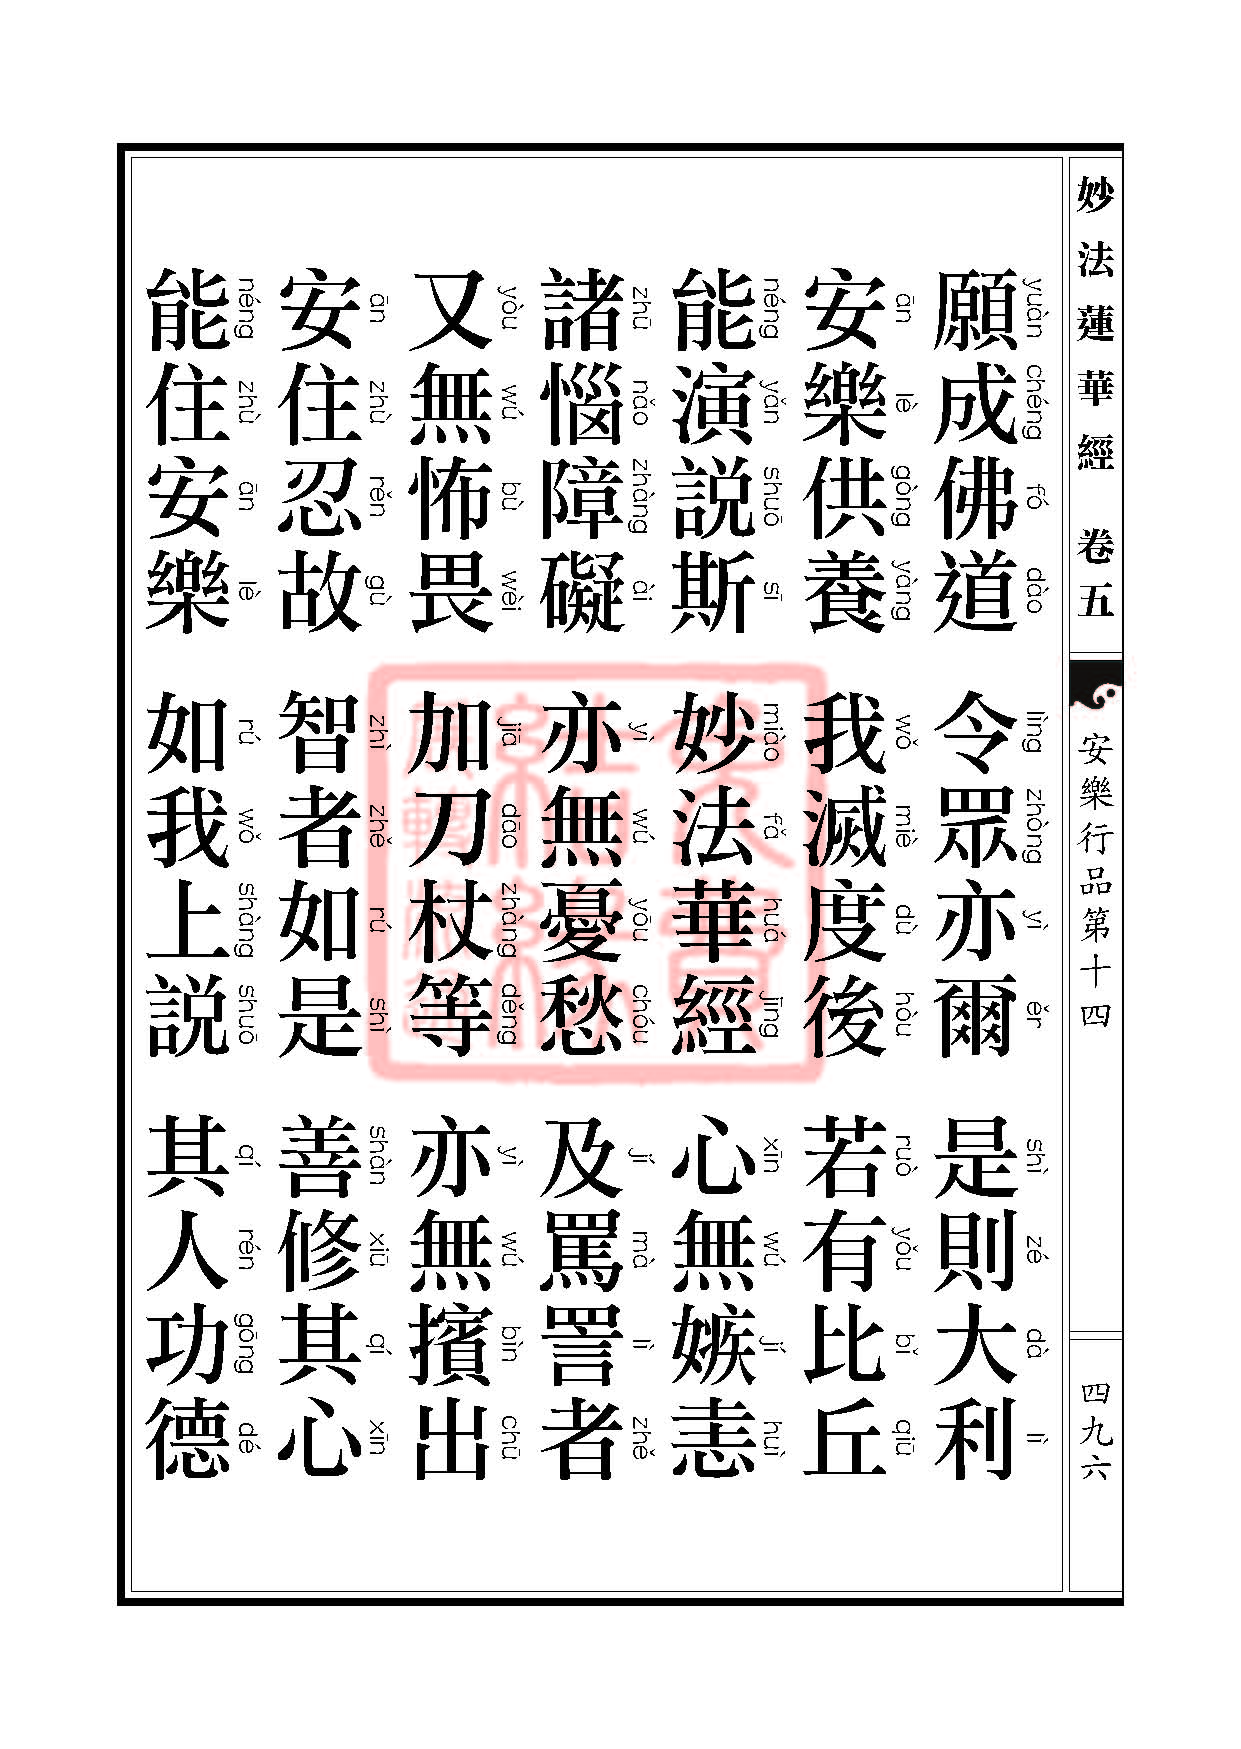 Book_FHJ_HK-A6-PY_Web_页面_496.jpg